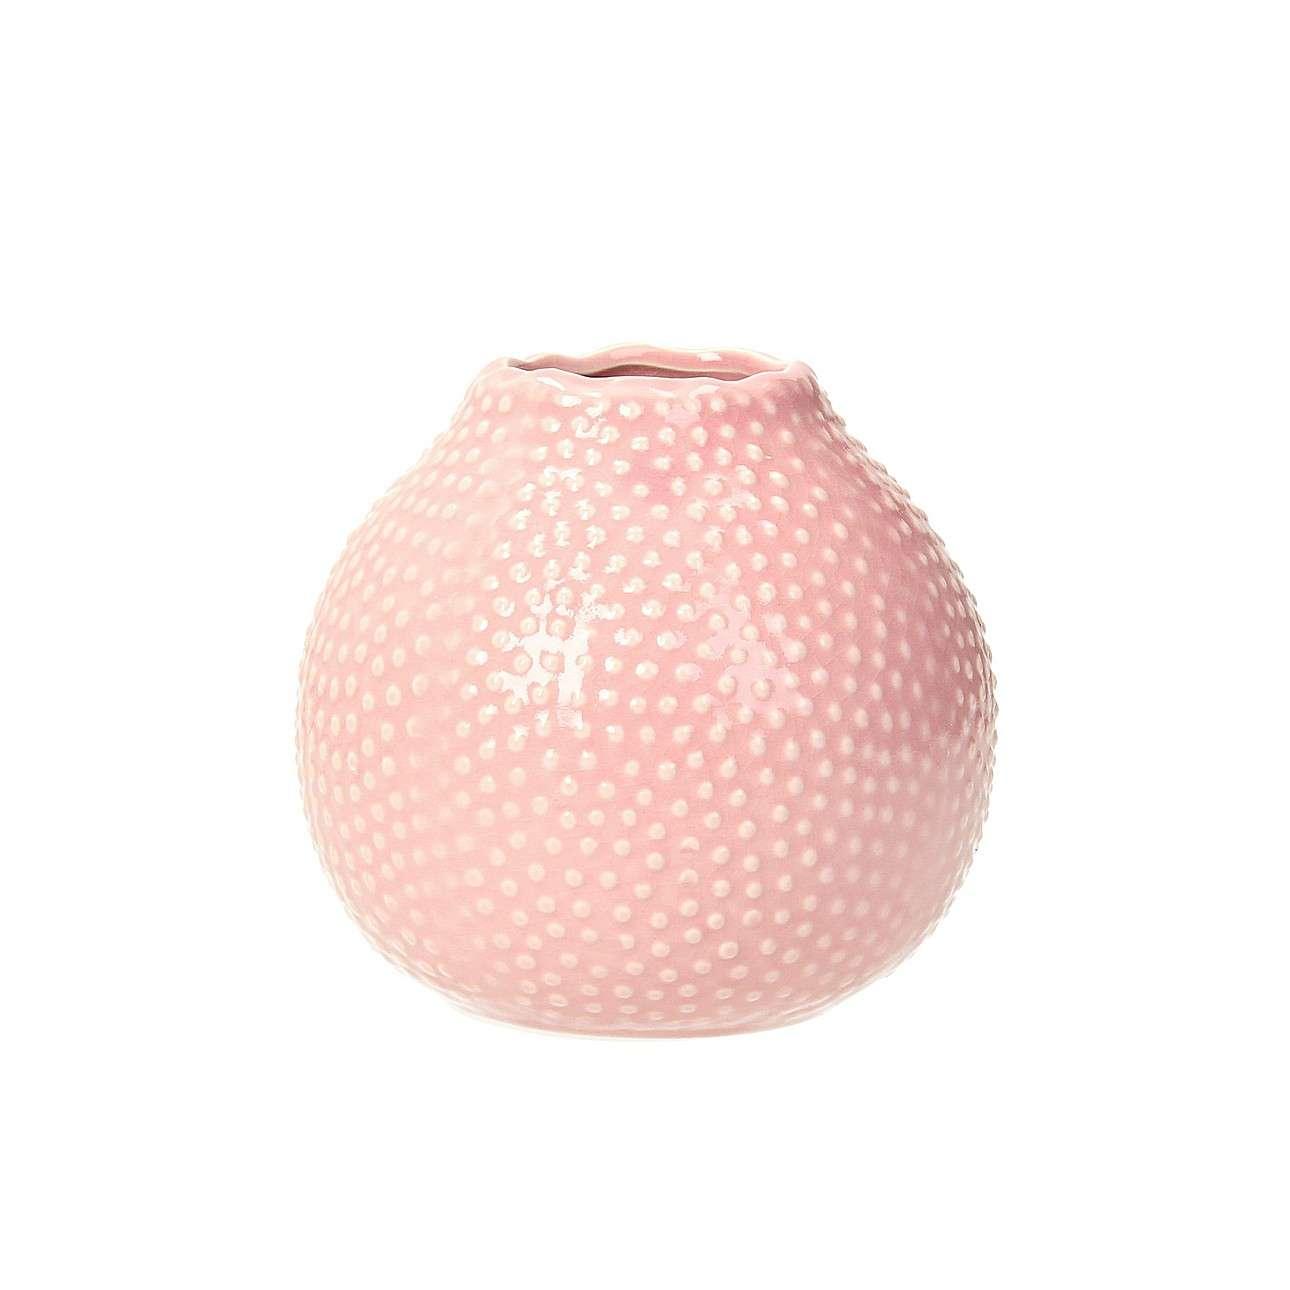 Váza Tessa Pink výška 13cm